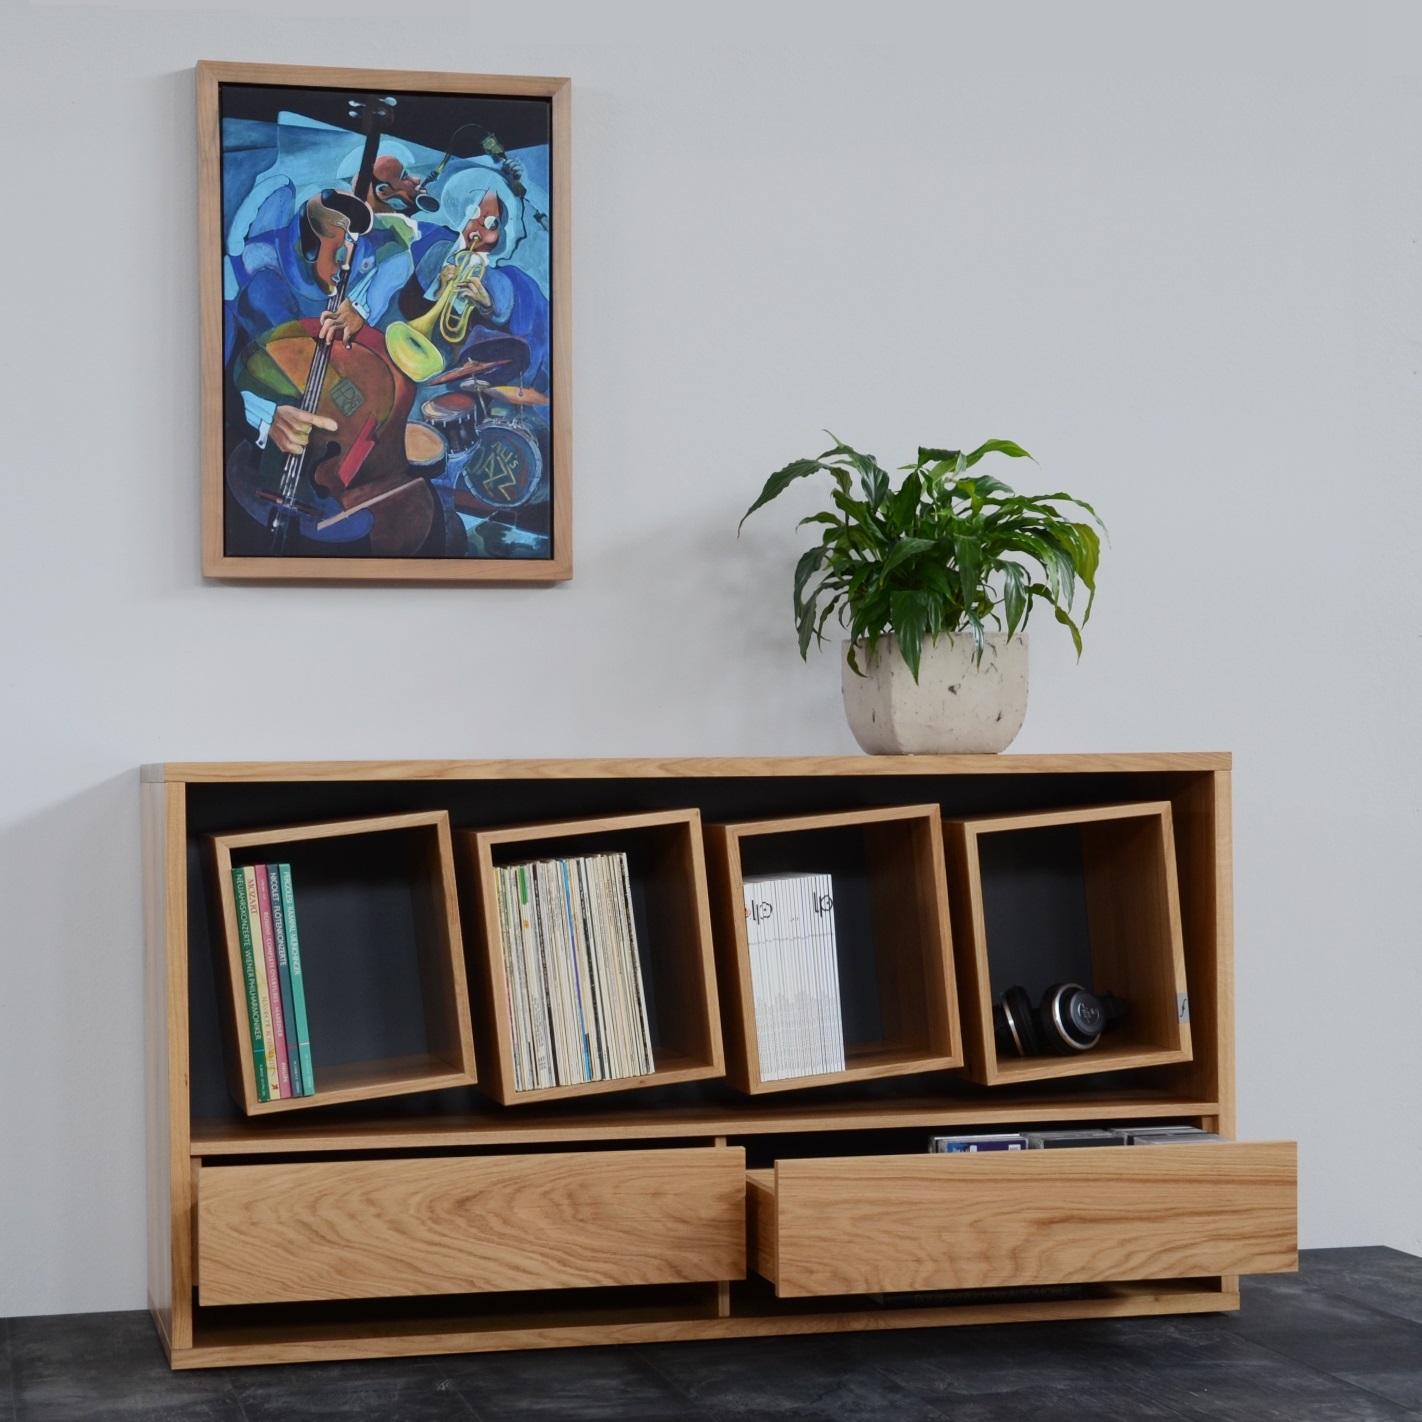 Regal Schallplatten | Wandregal Selber Bauen Einzigartig 39 Elegant ...